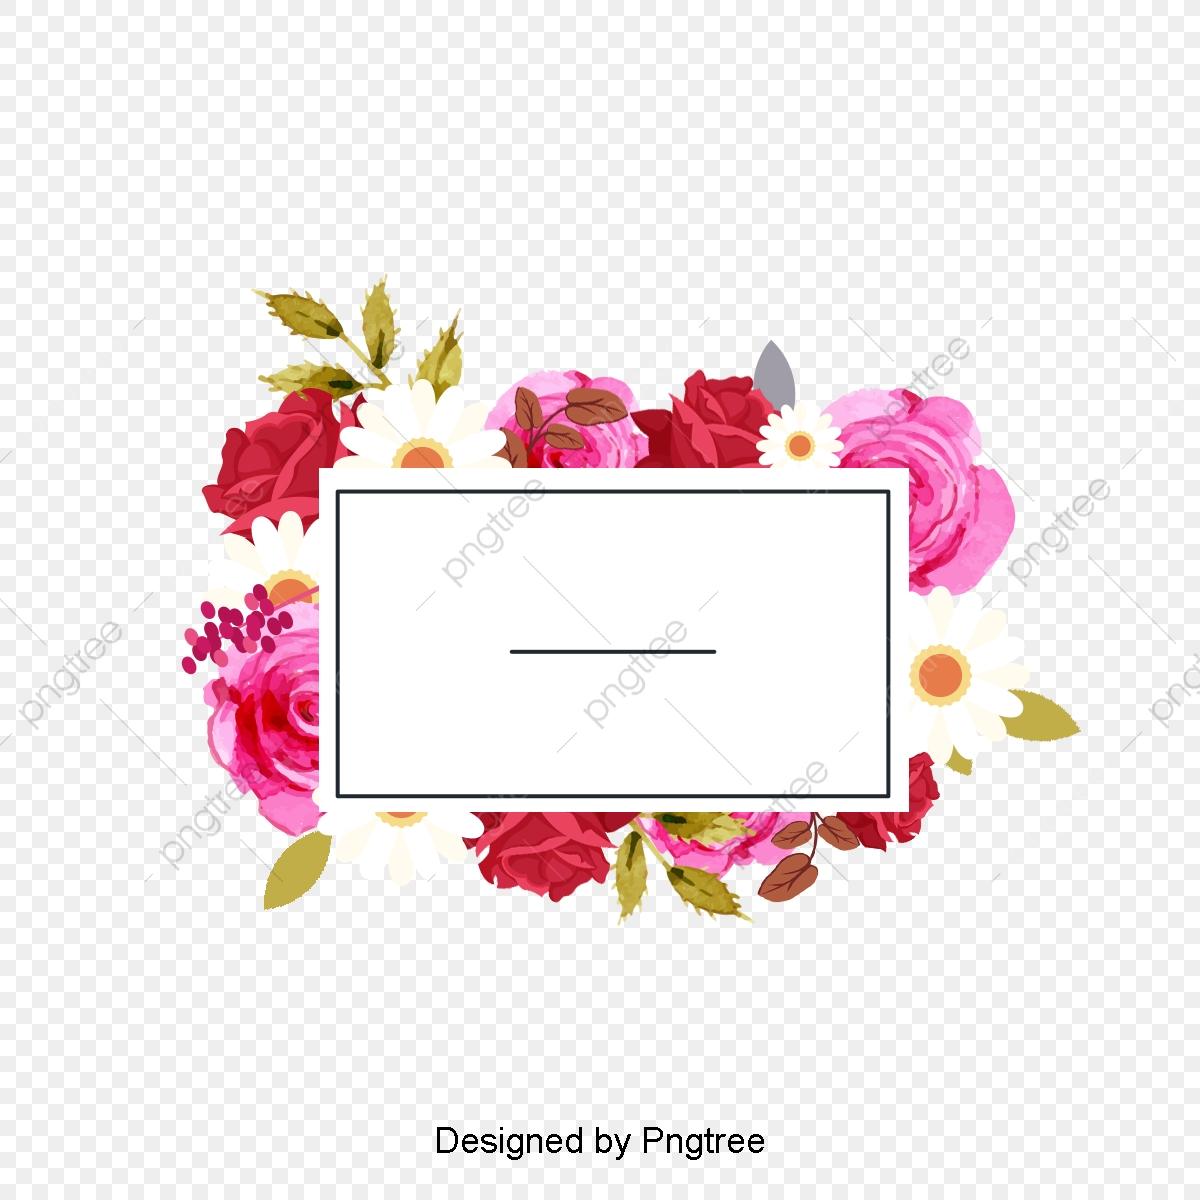 Flower Frame, Flower, Frame PNG Transparent Clipart Image and PSD.